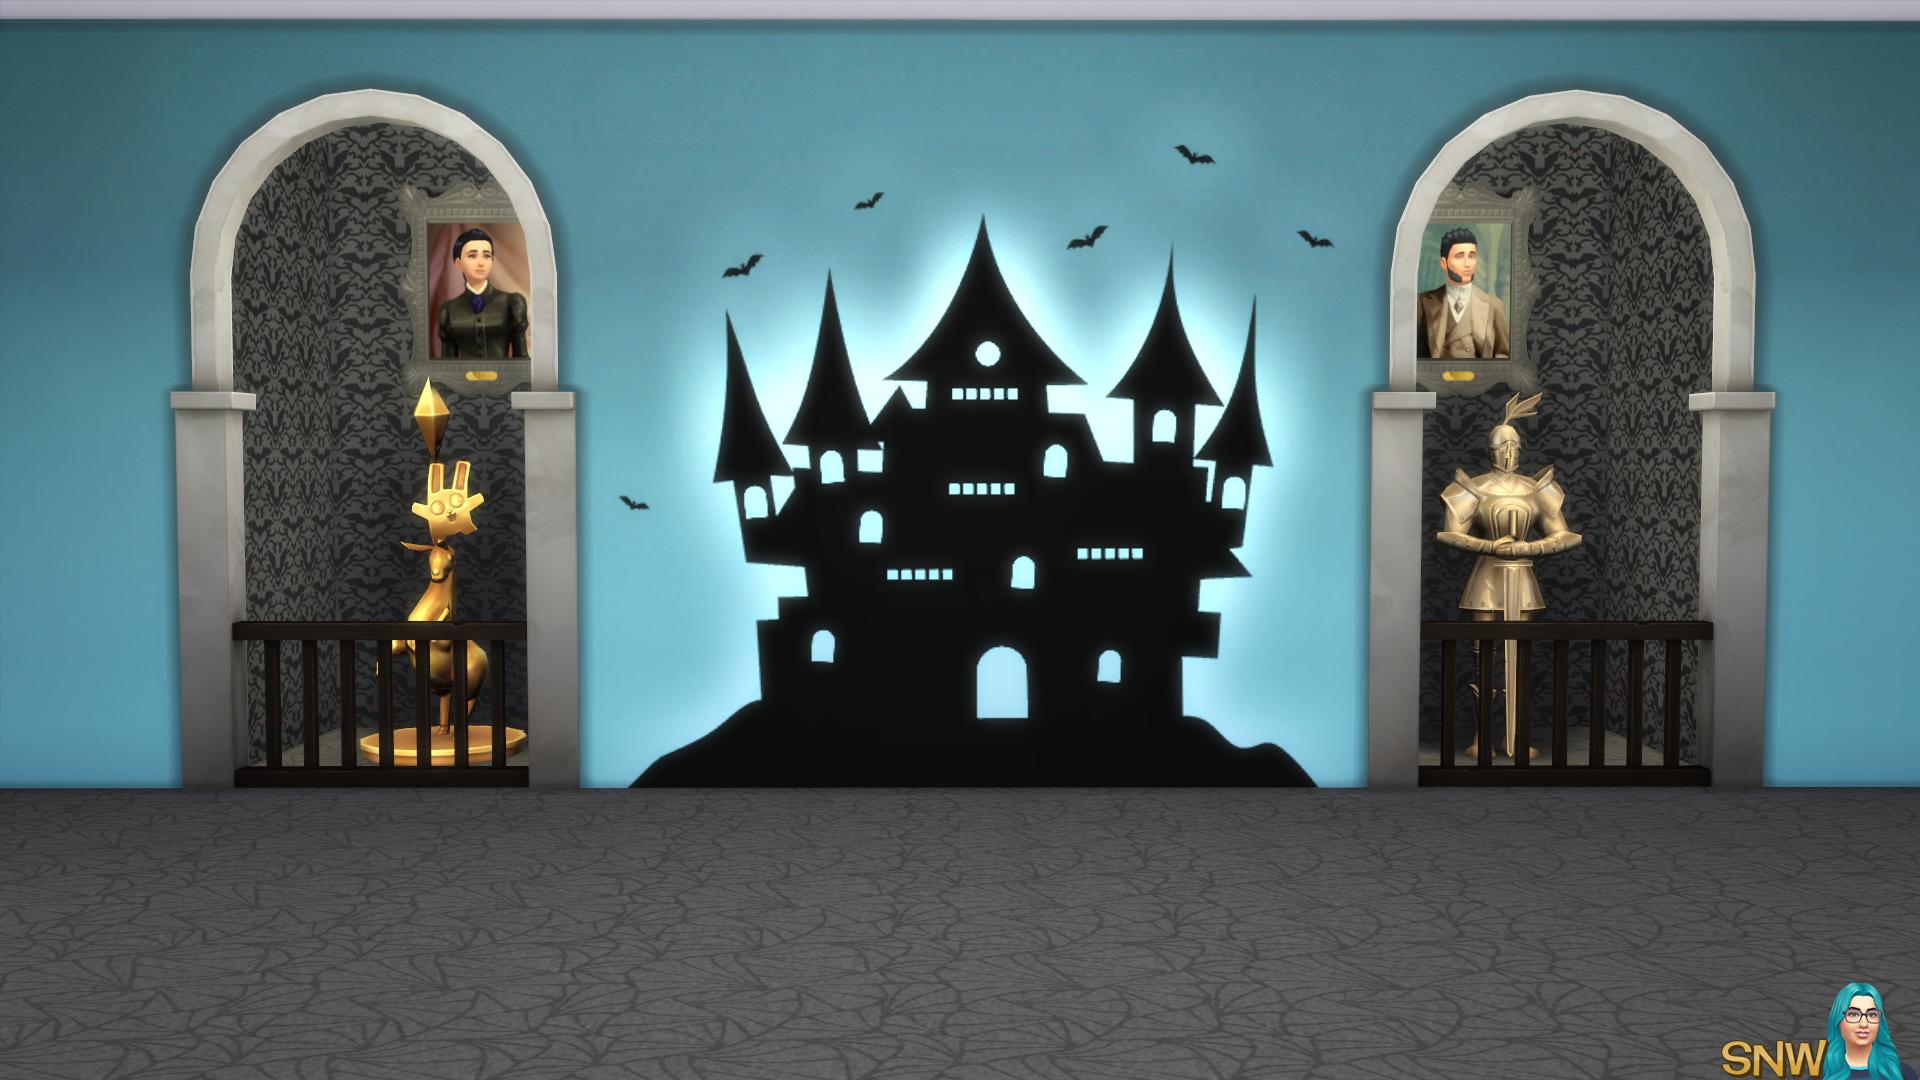 Halloween 2016 Mural 1 Snw Simsnetwork Com